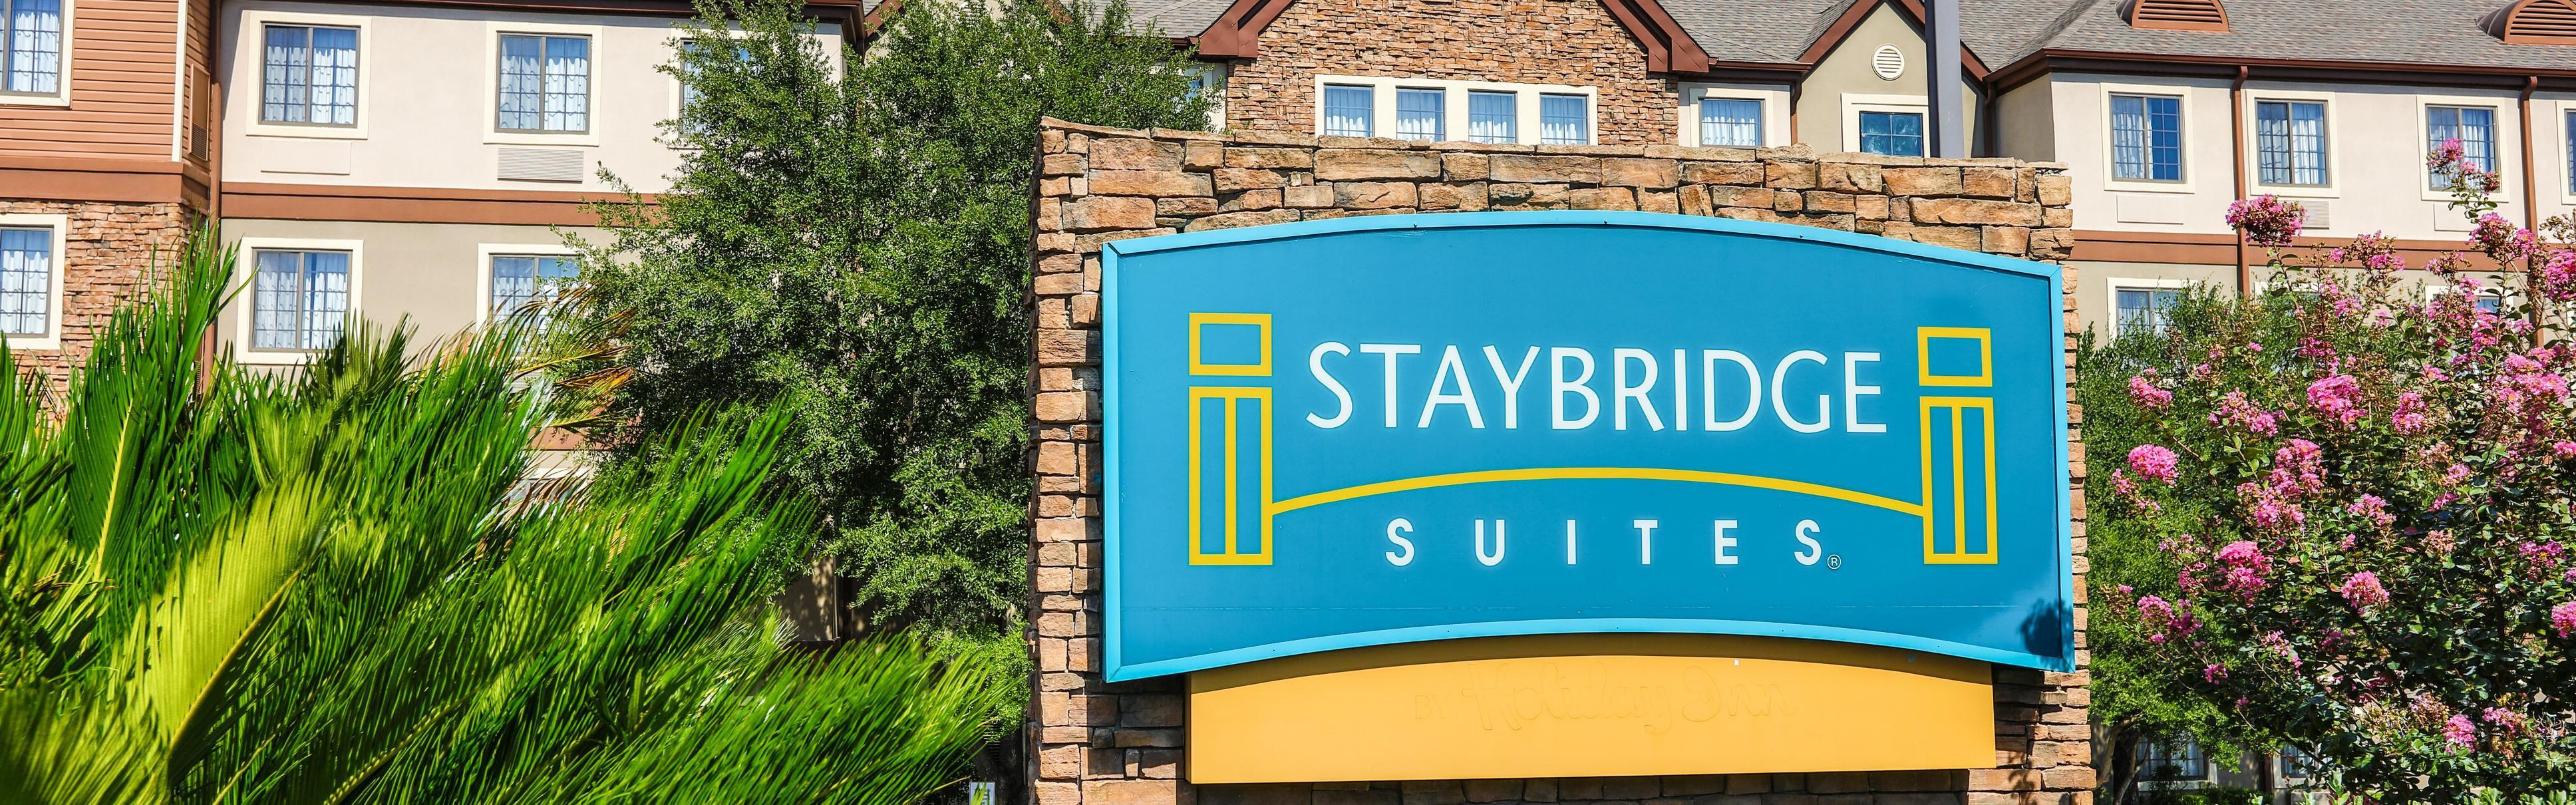 Staybridge Suites Austin Arboretum - Domain image 0